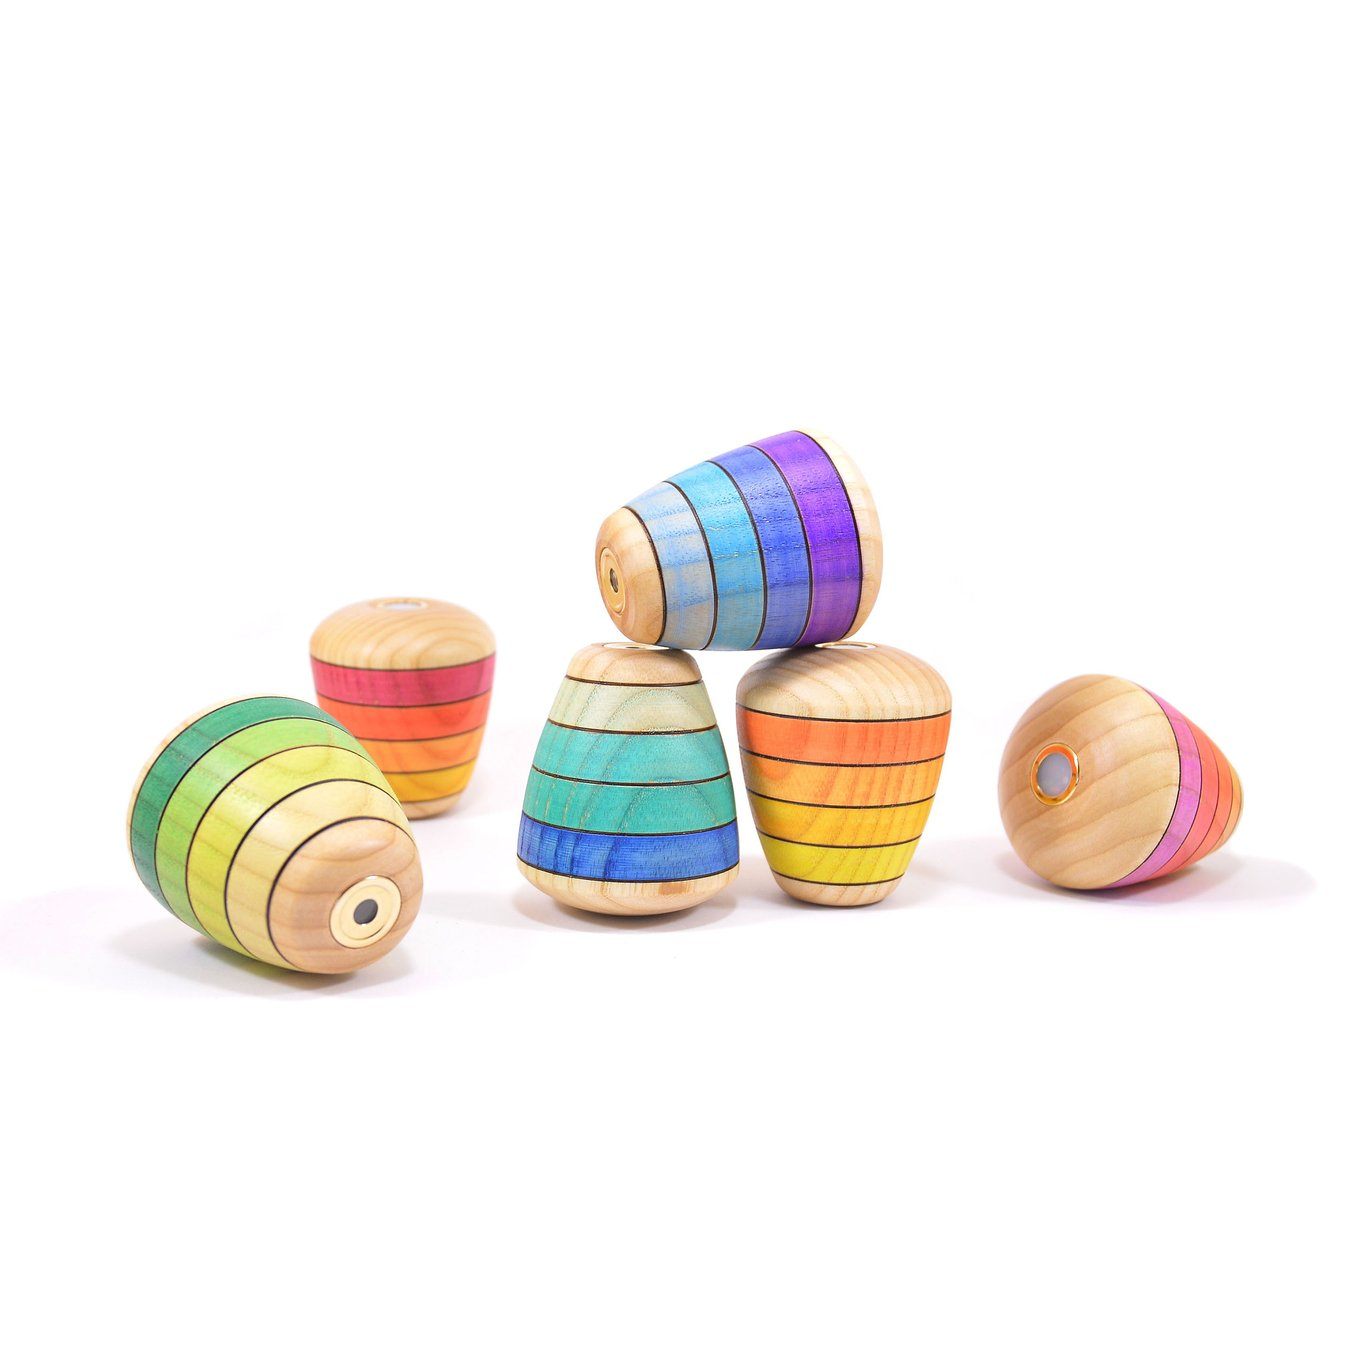 Caleidoscópio Colorido | Mader Kreiselmanufaktur